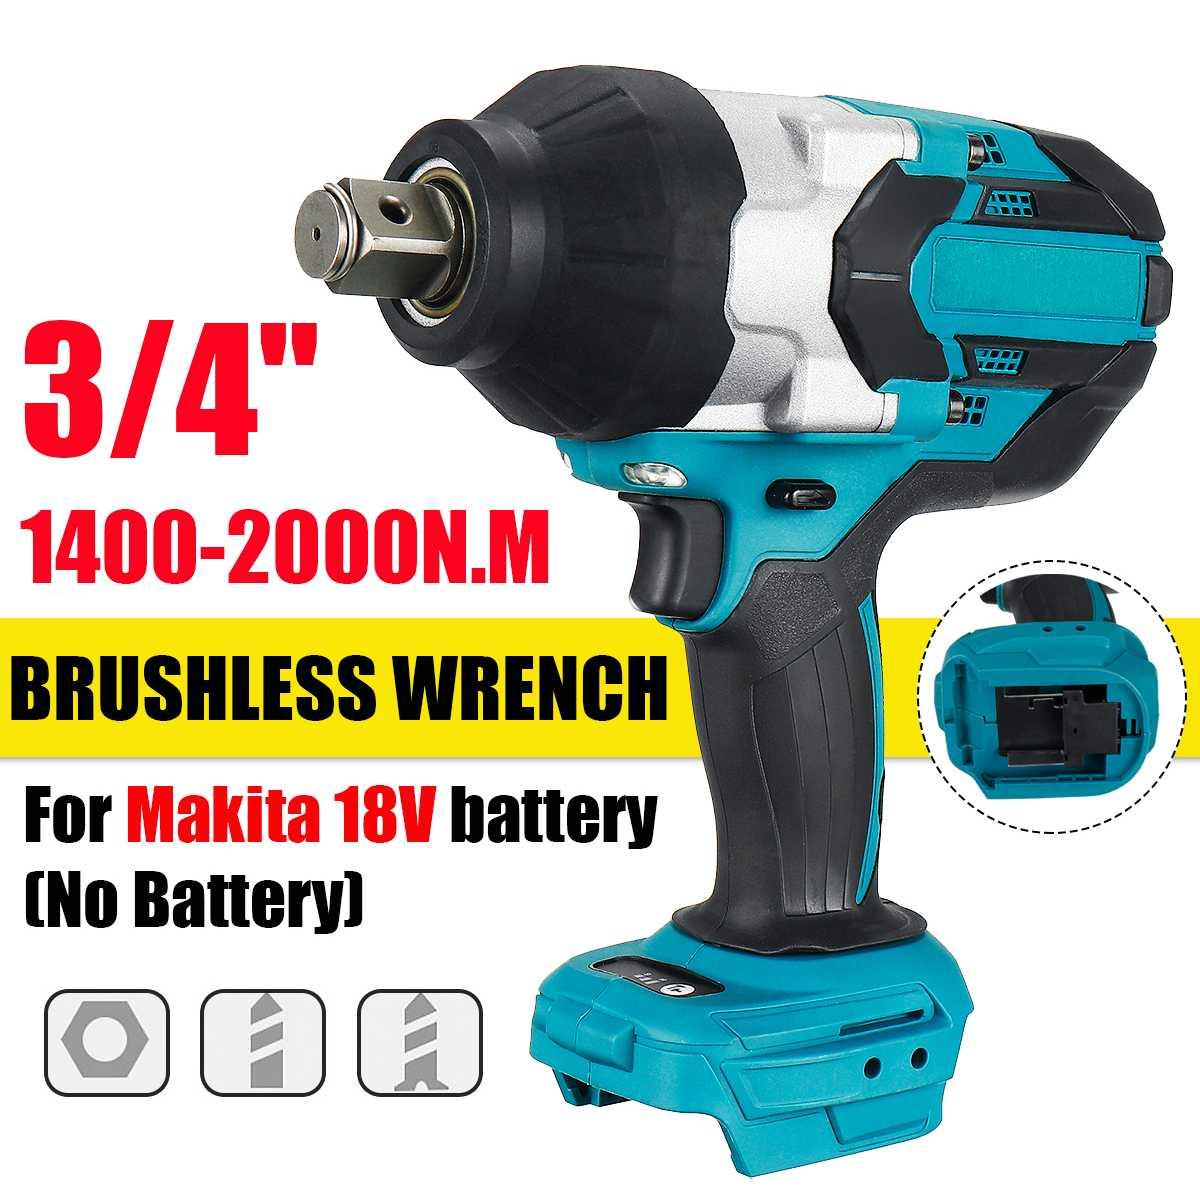 Drillpro عزم دوران عال 2000N.m فرش مفتاح برغي كهربائي 3/4 بوصة مفتاح بانة أداة سائق لاسلكي لبطارية ماكيتا 18 فولت